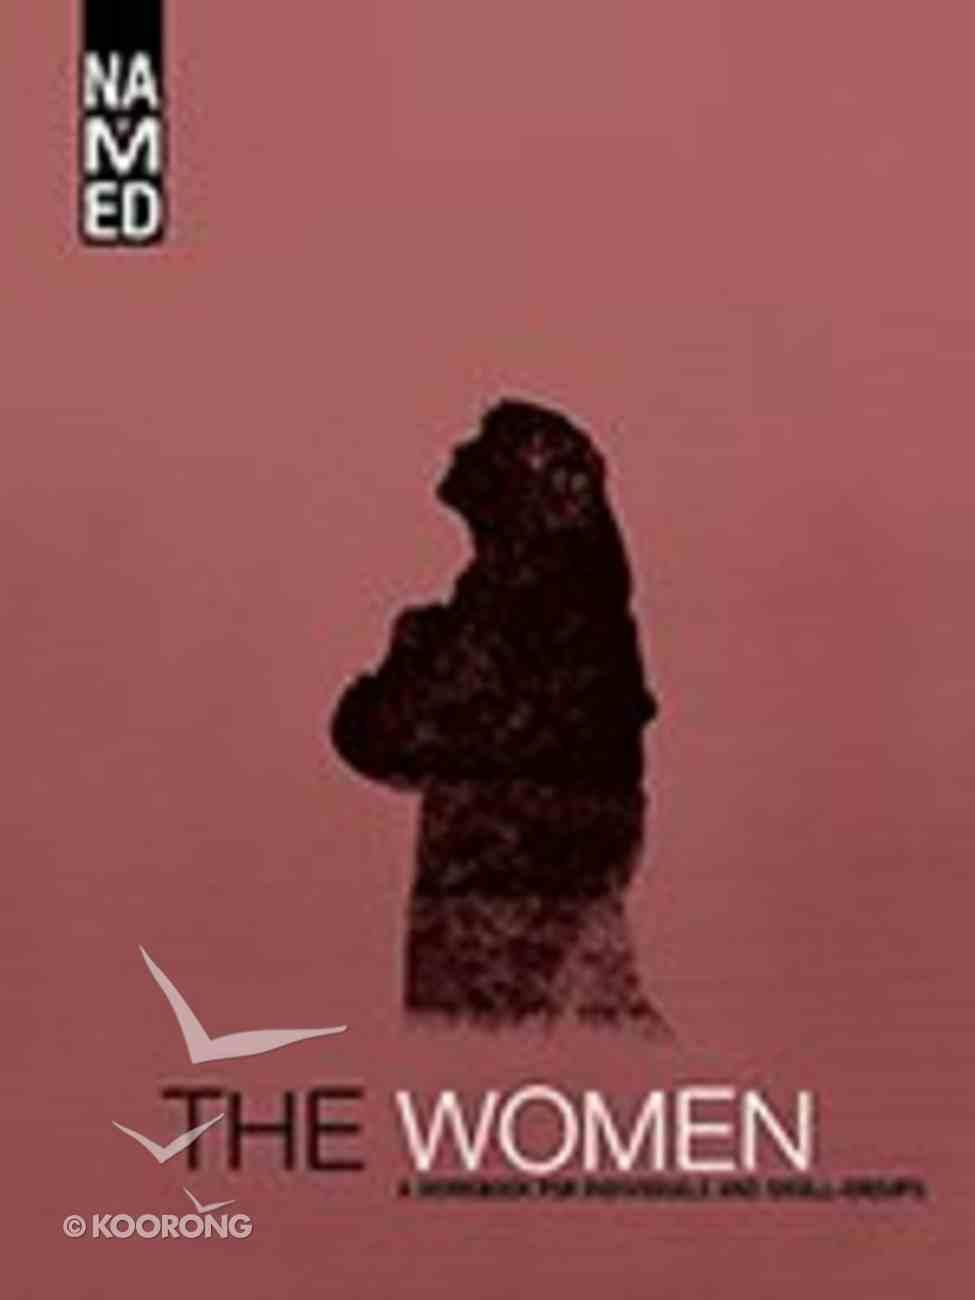 The Women (Workbook) (Named Series) Paperback